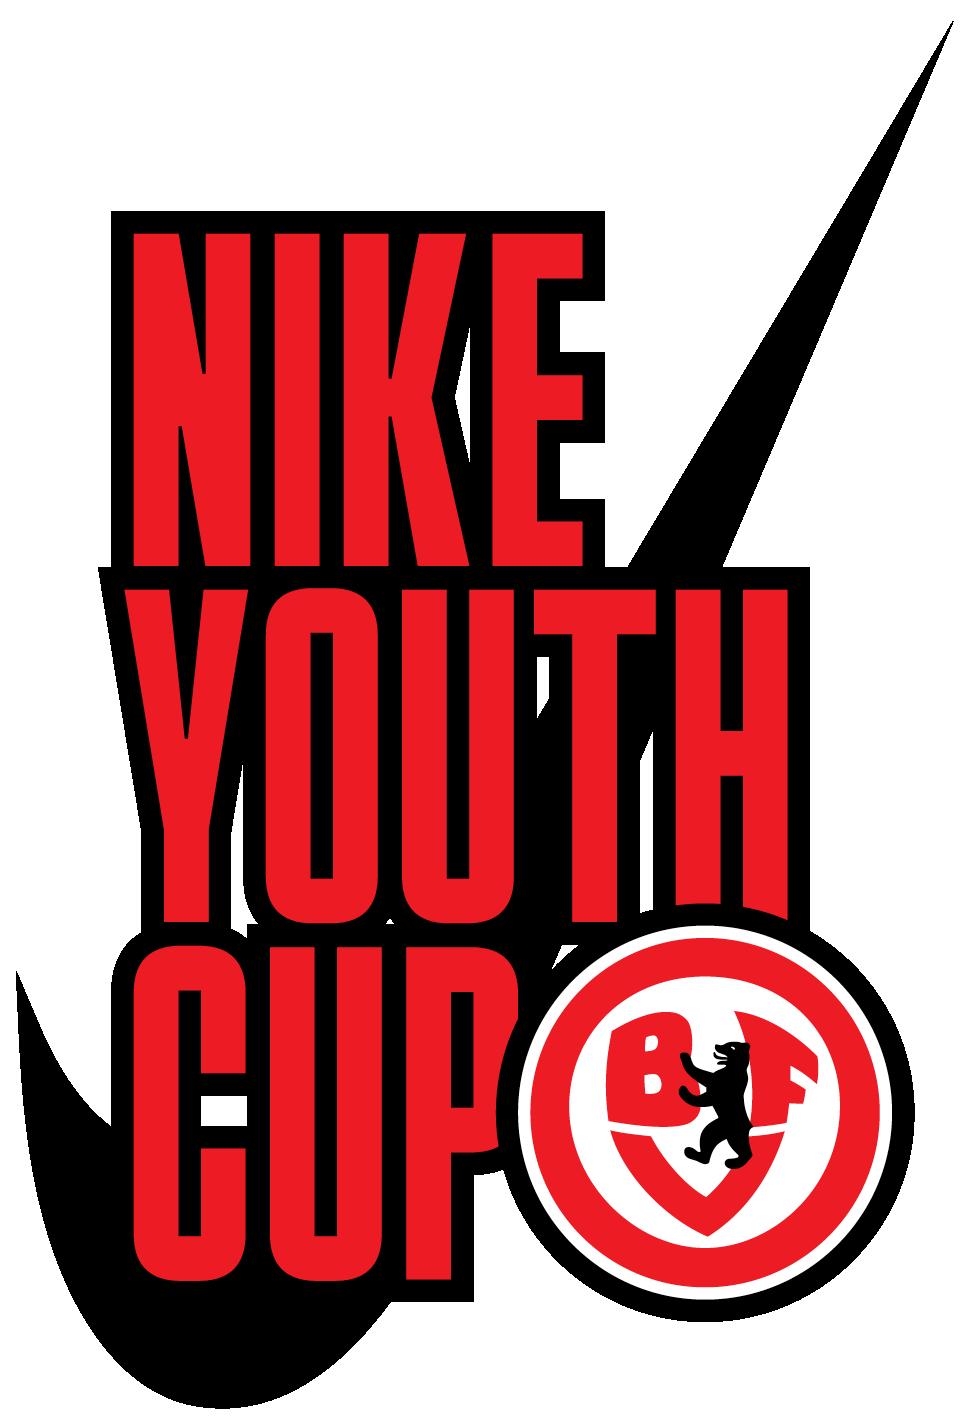 NikeYouthCup Logo